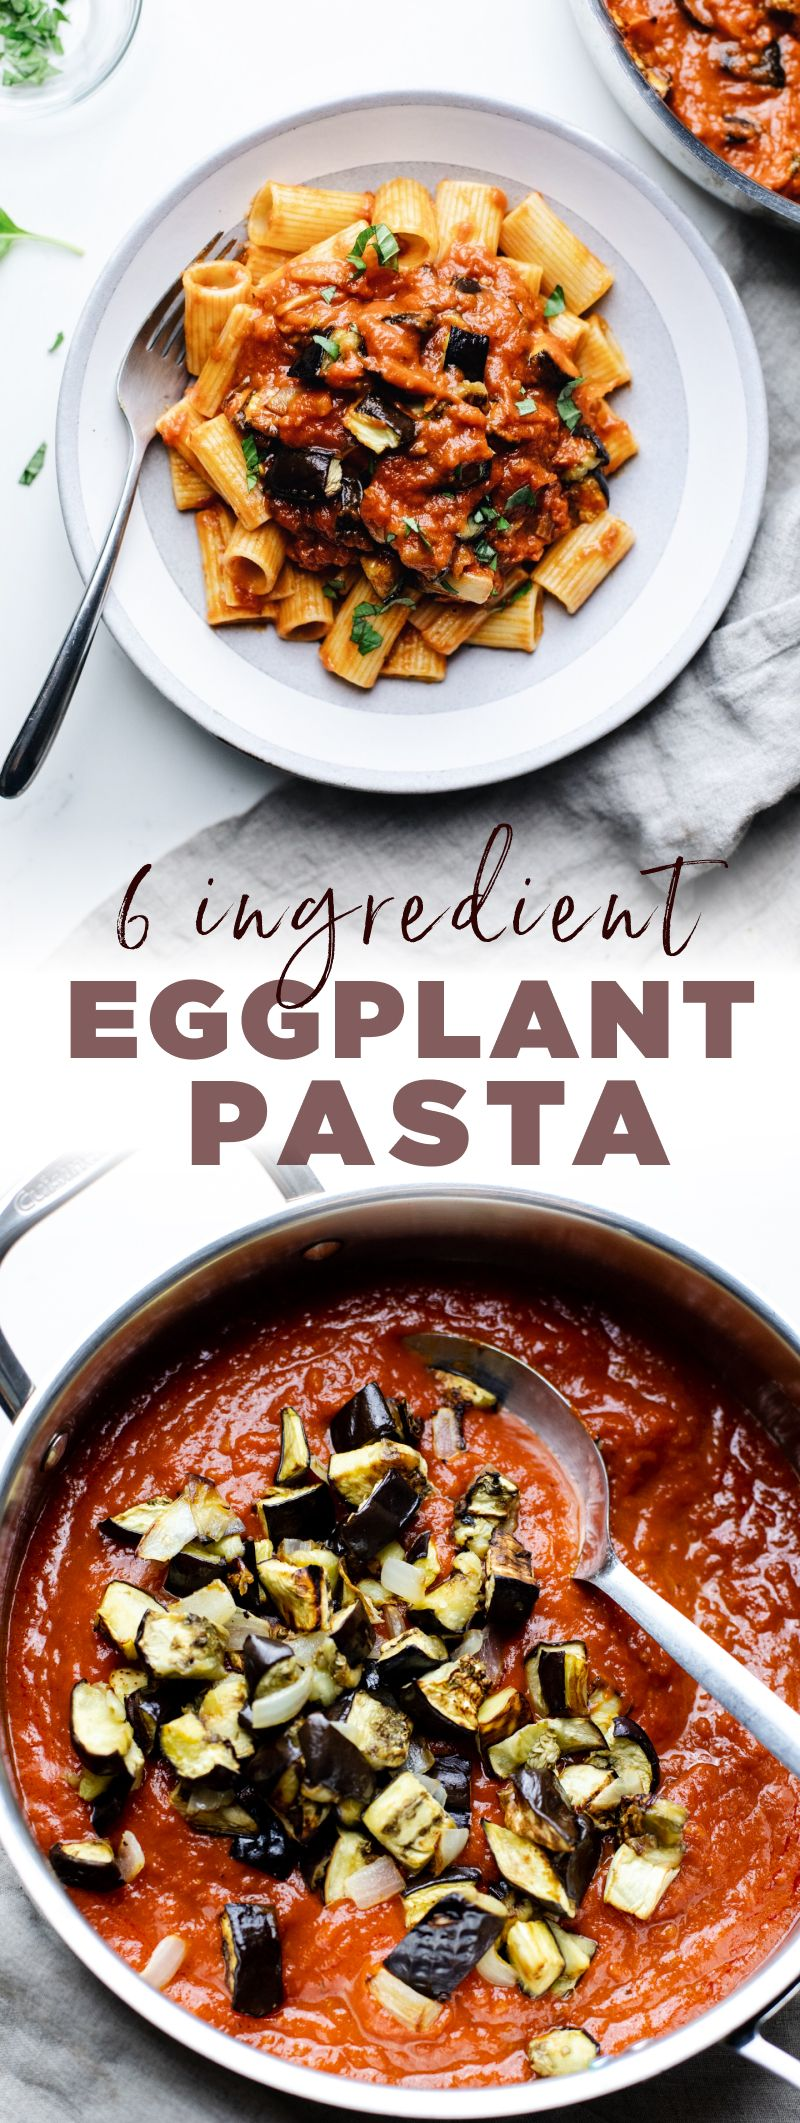 Roasted Eggplant Pasta 6 Ingredients A Simple Palate Recipe In 2020 Eggplant Recipes Roasted Eggplant Pasta Eggplant Pasta